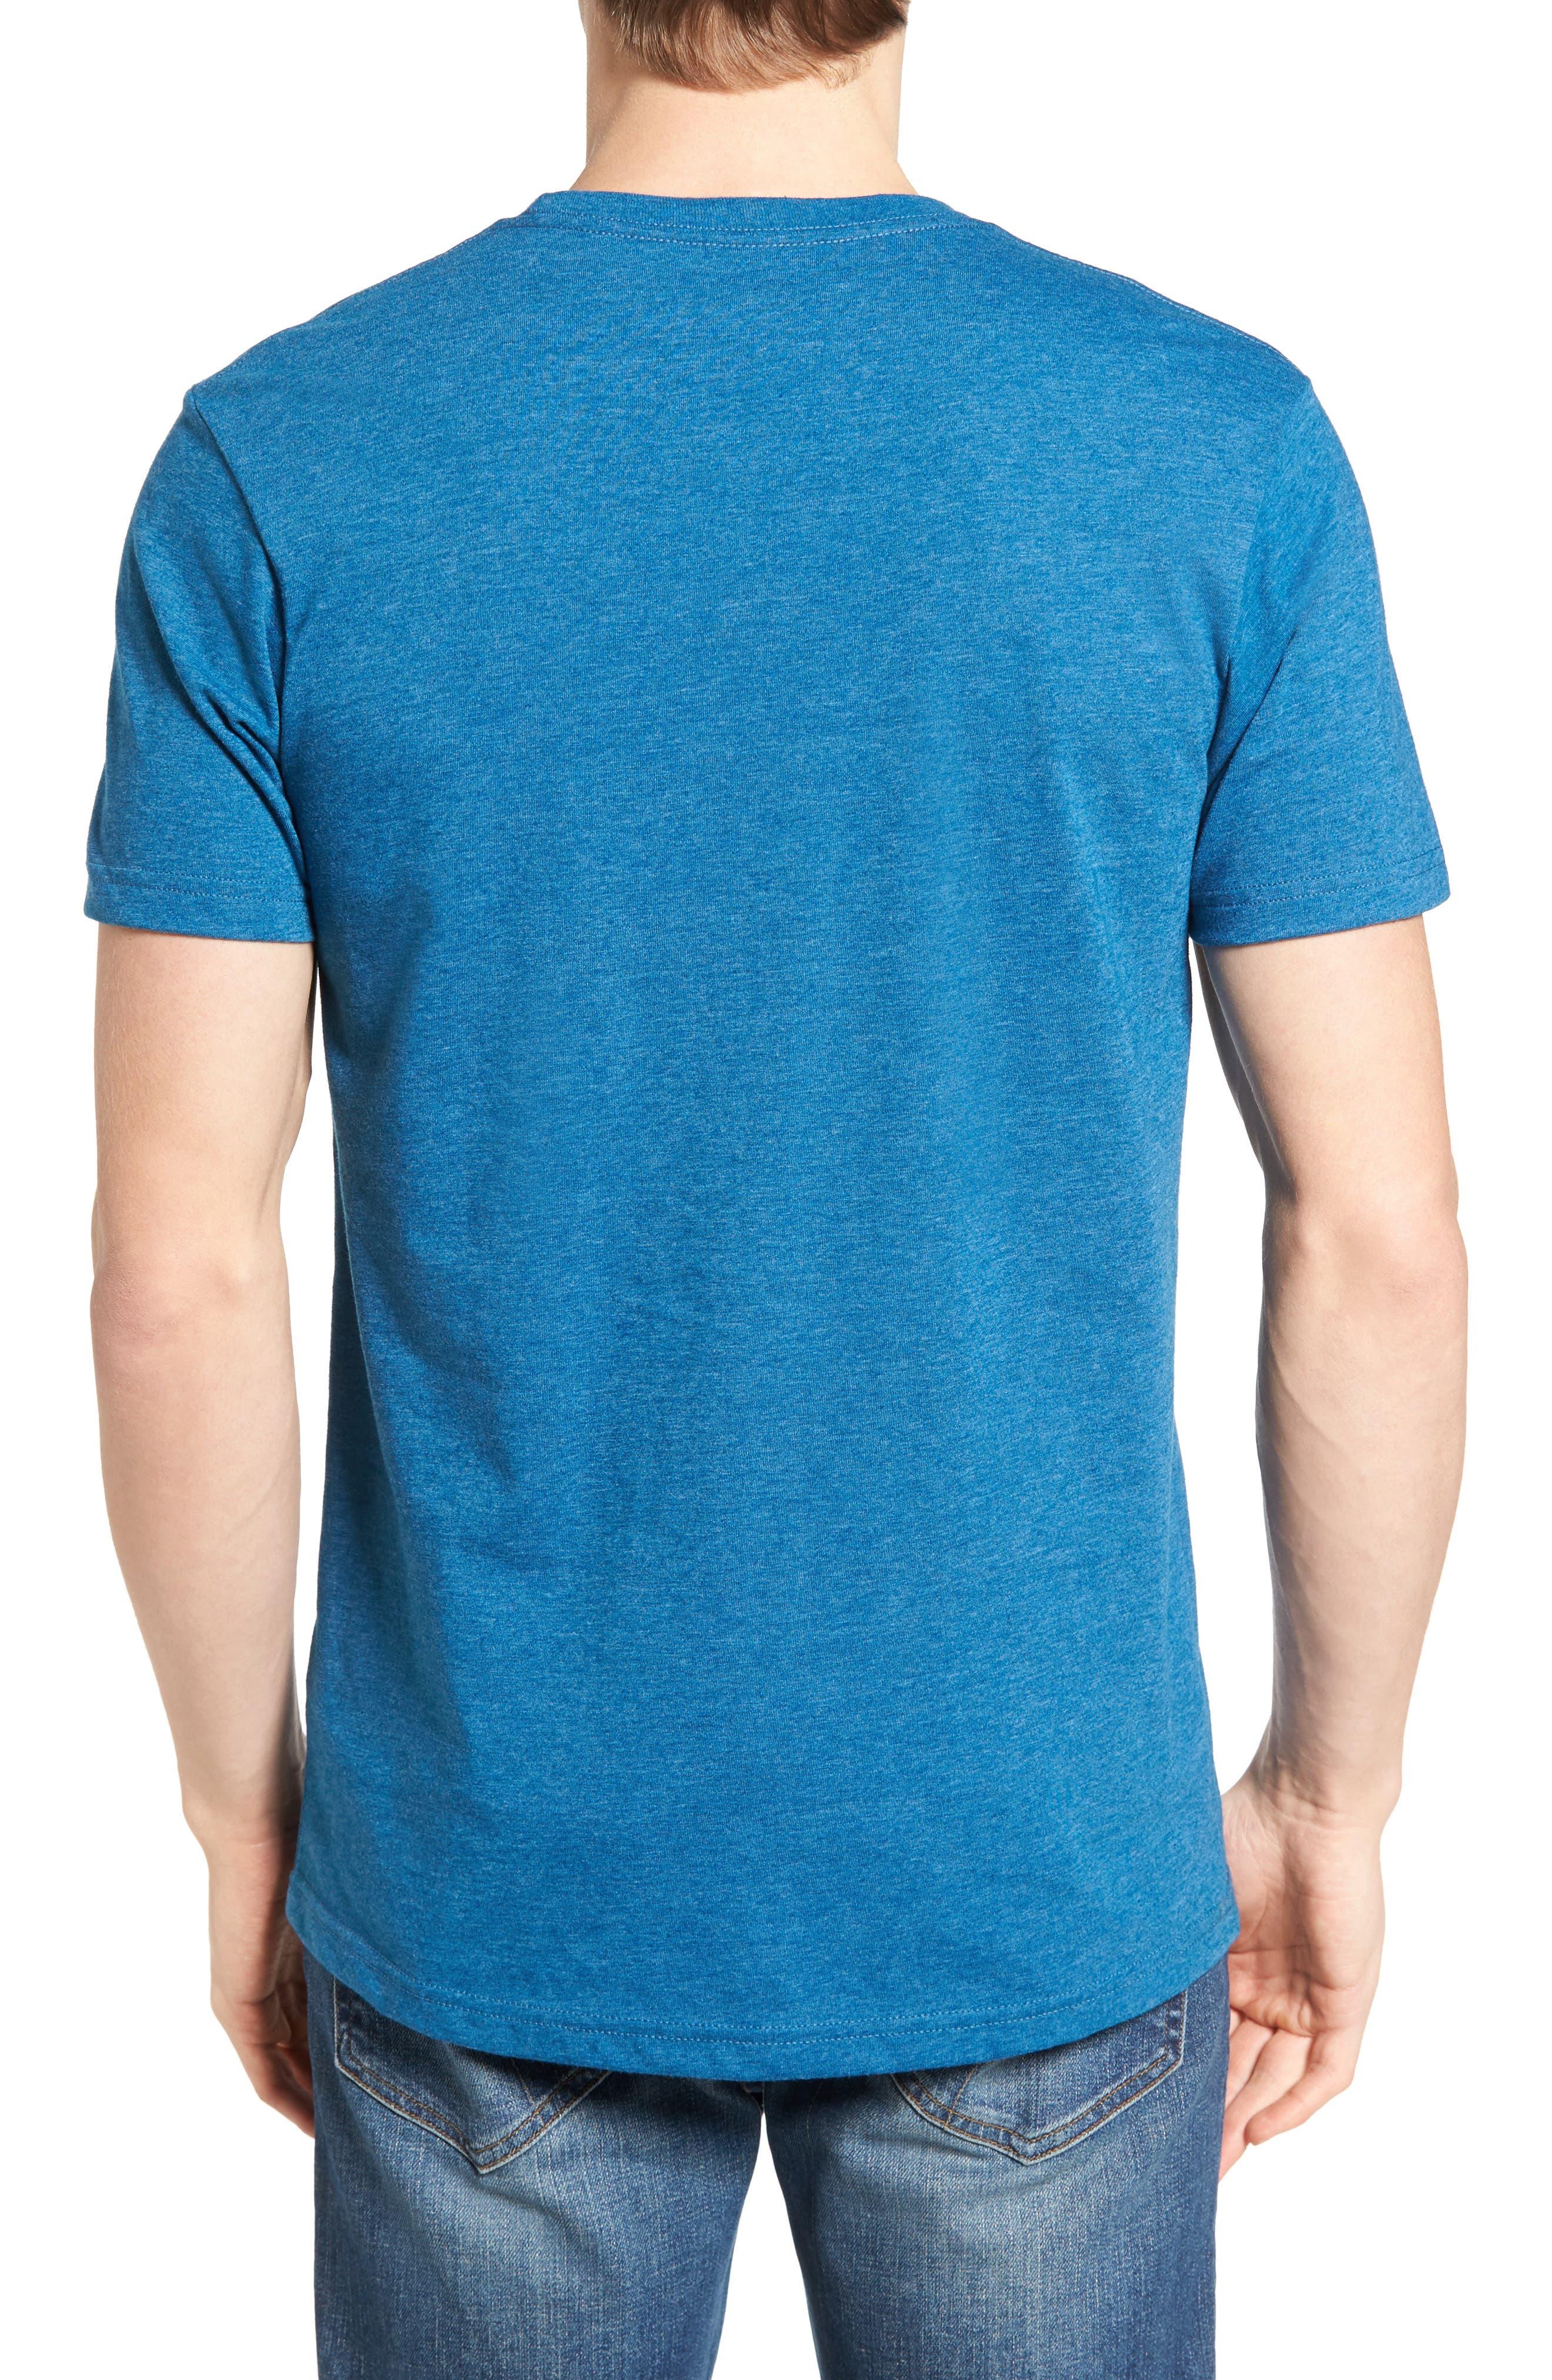 Board Short Label T-Shirt,                             Alternate thumbnail 2, color,